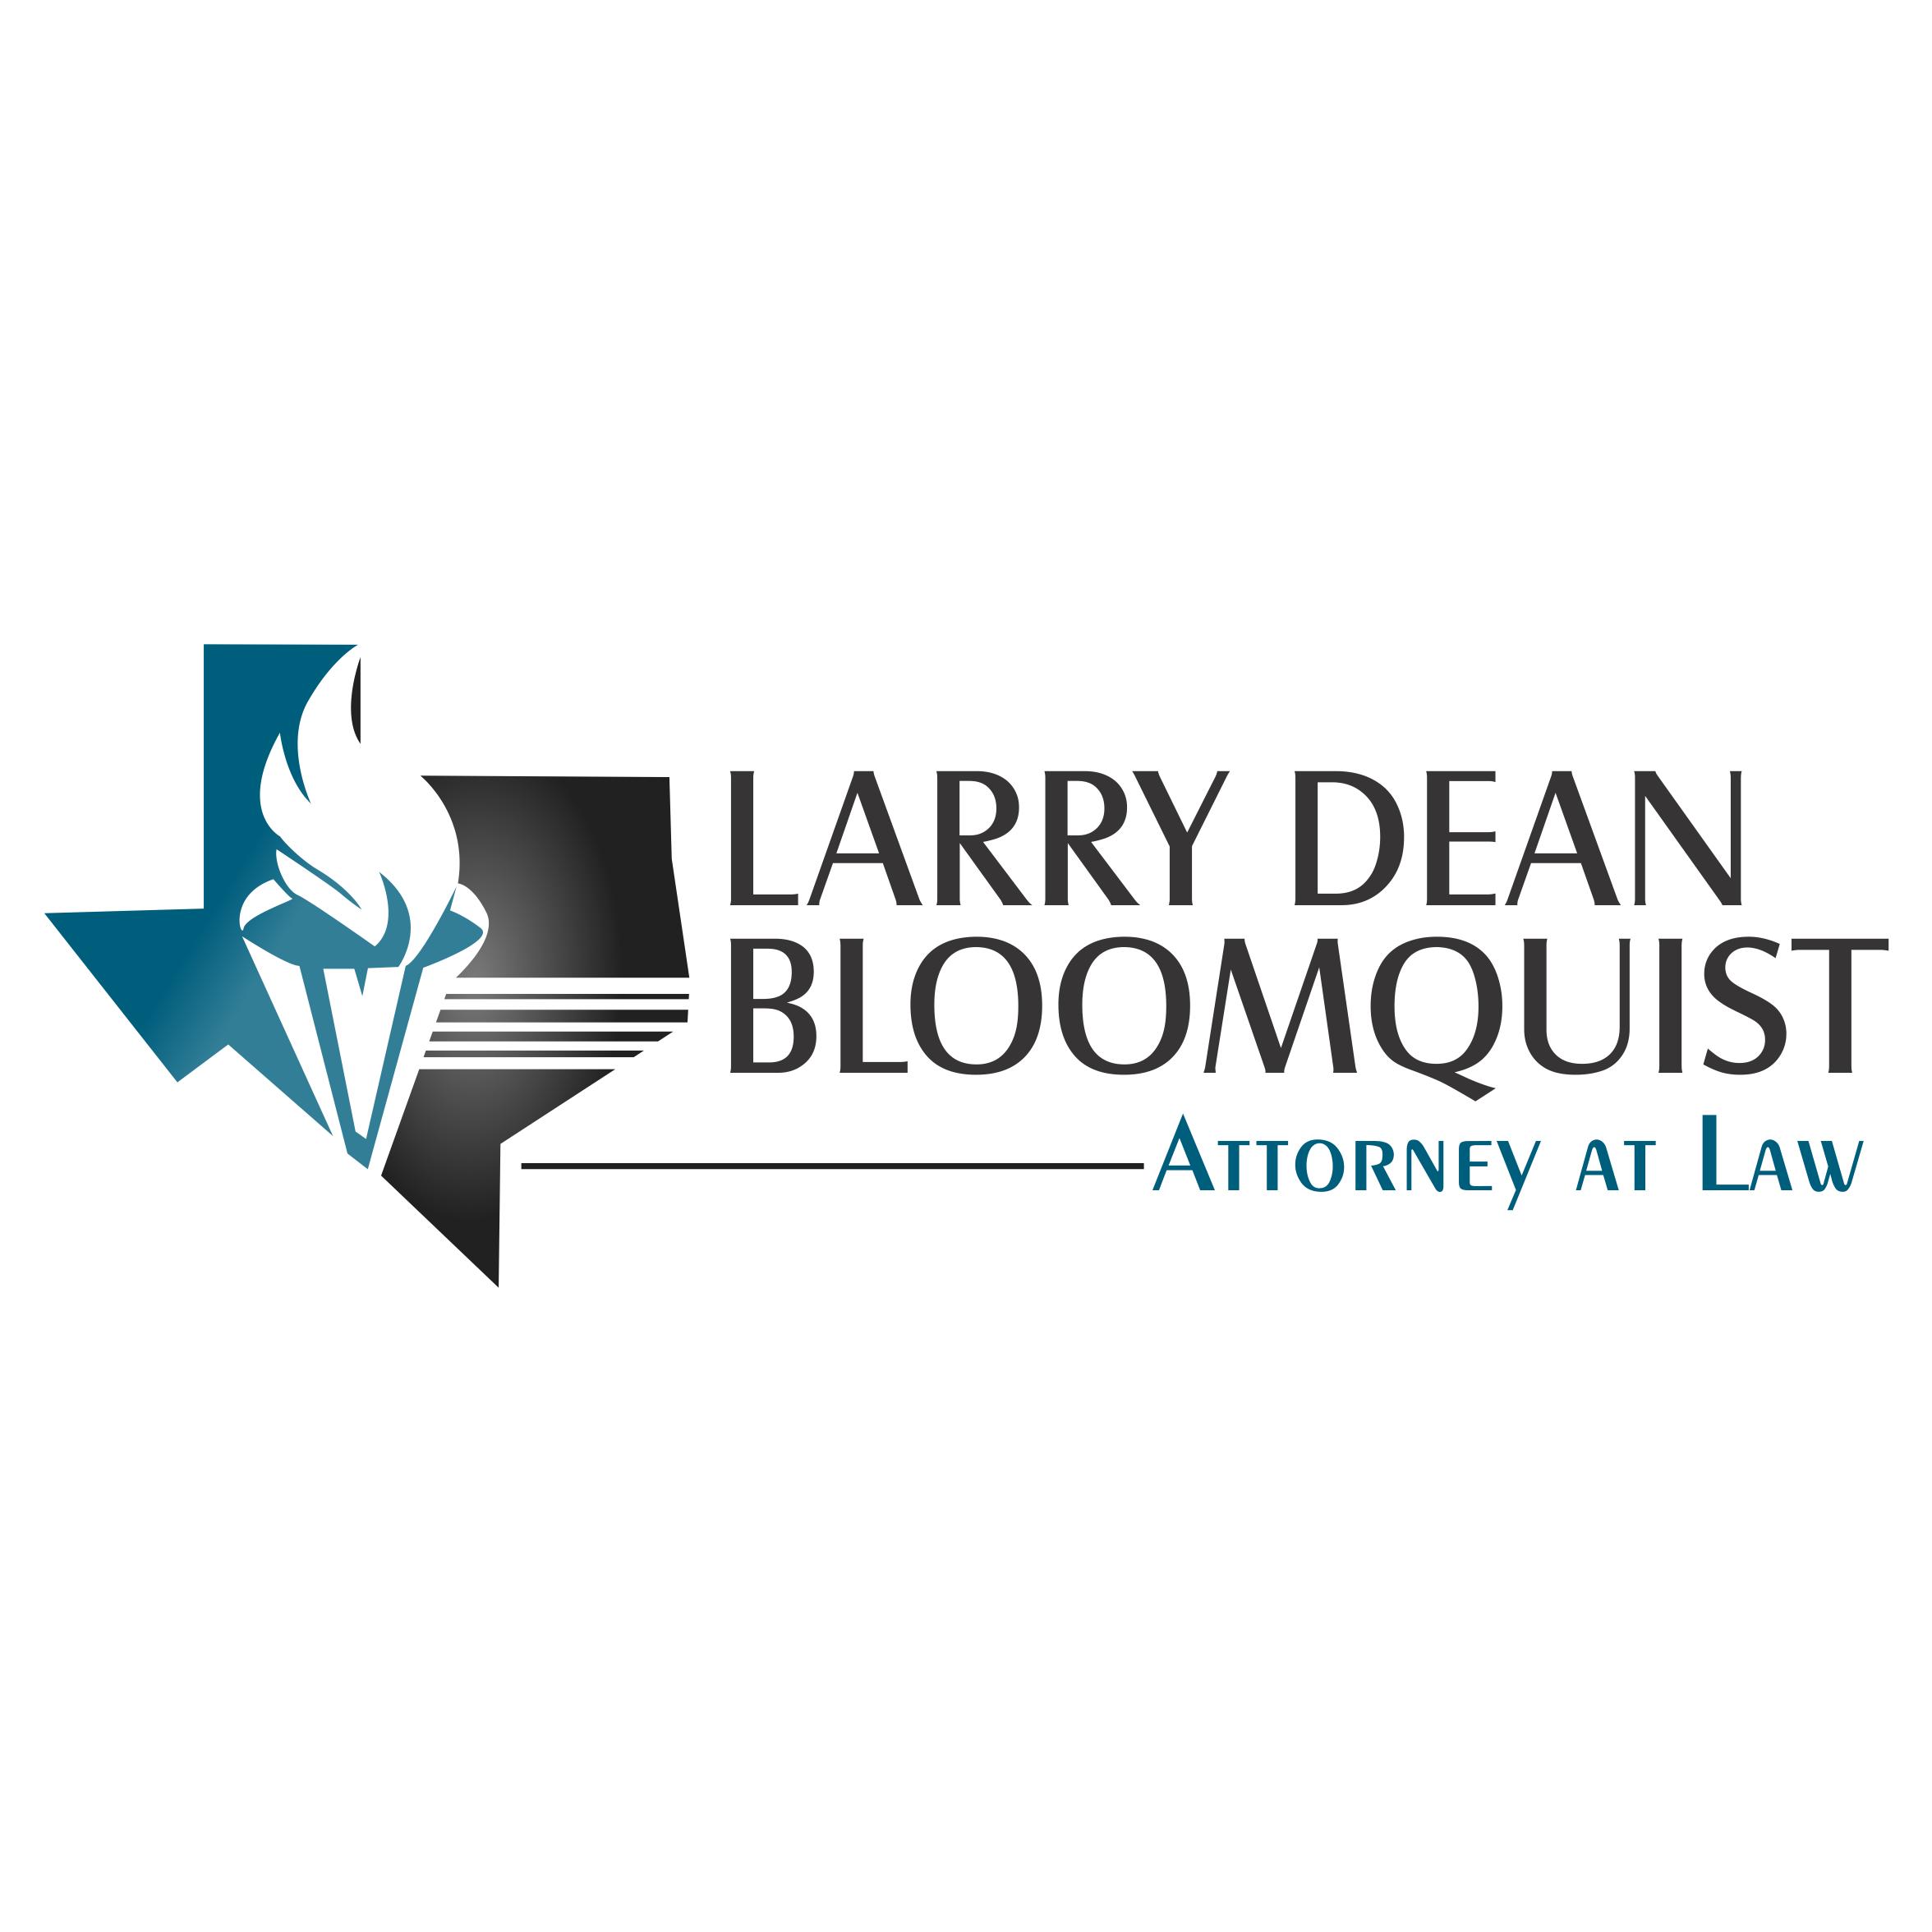 Larry Dean Bloomquist, Attorney at Law